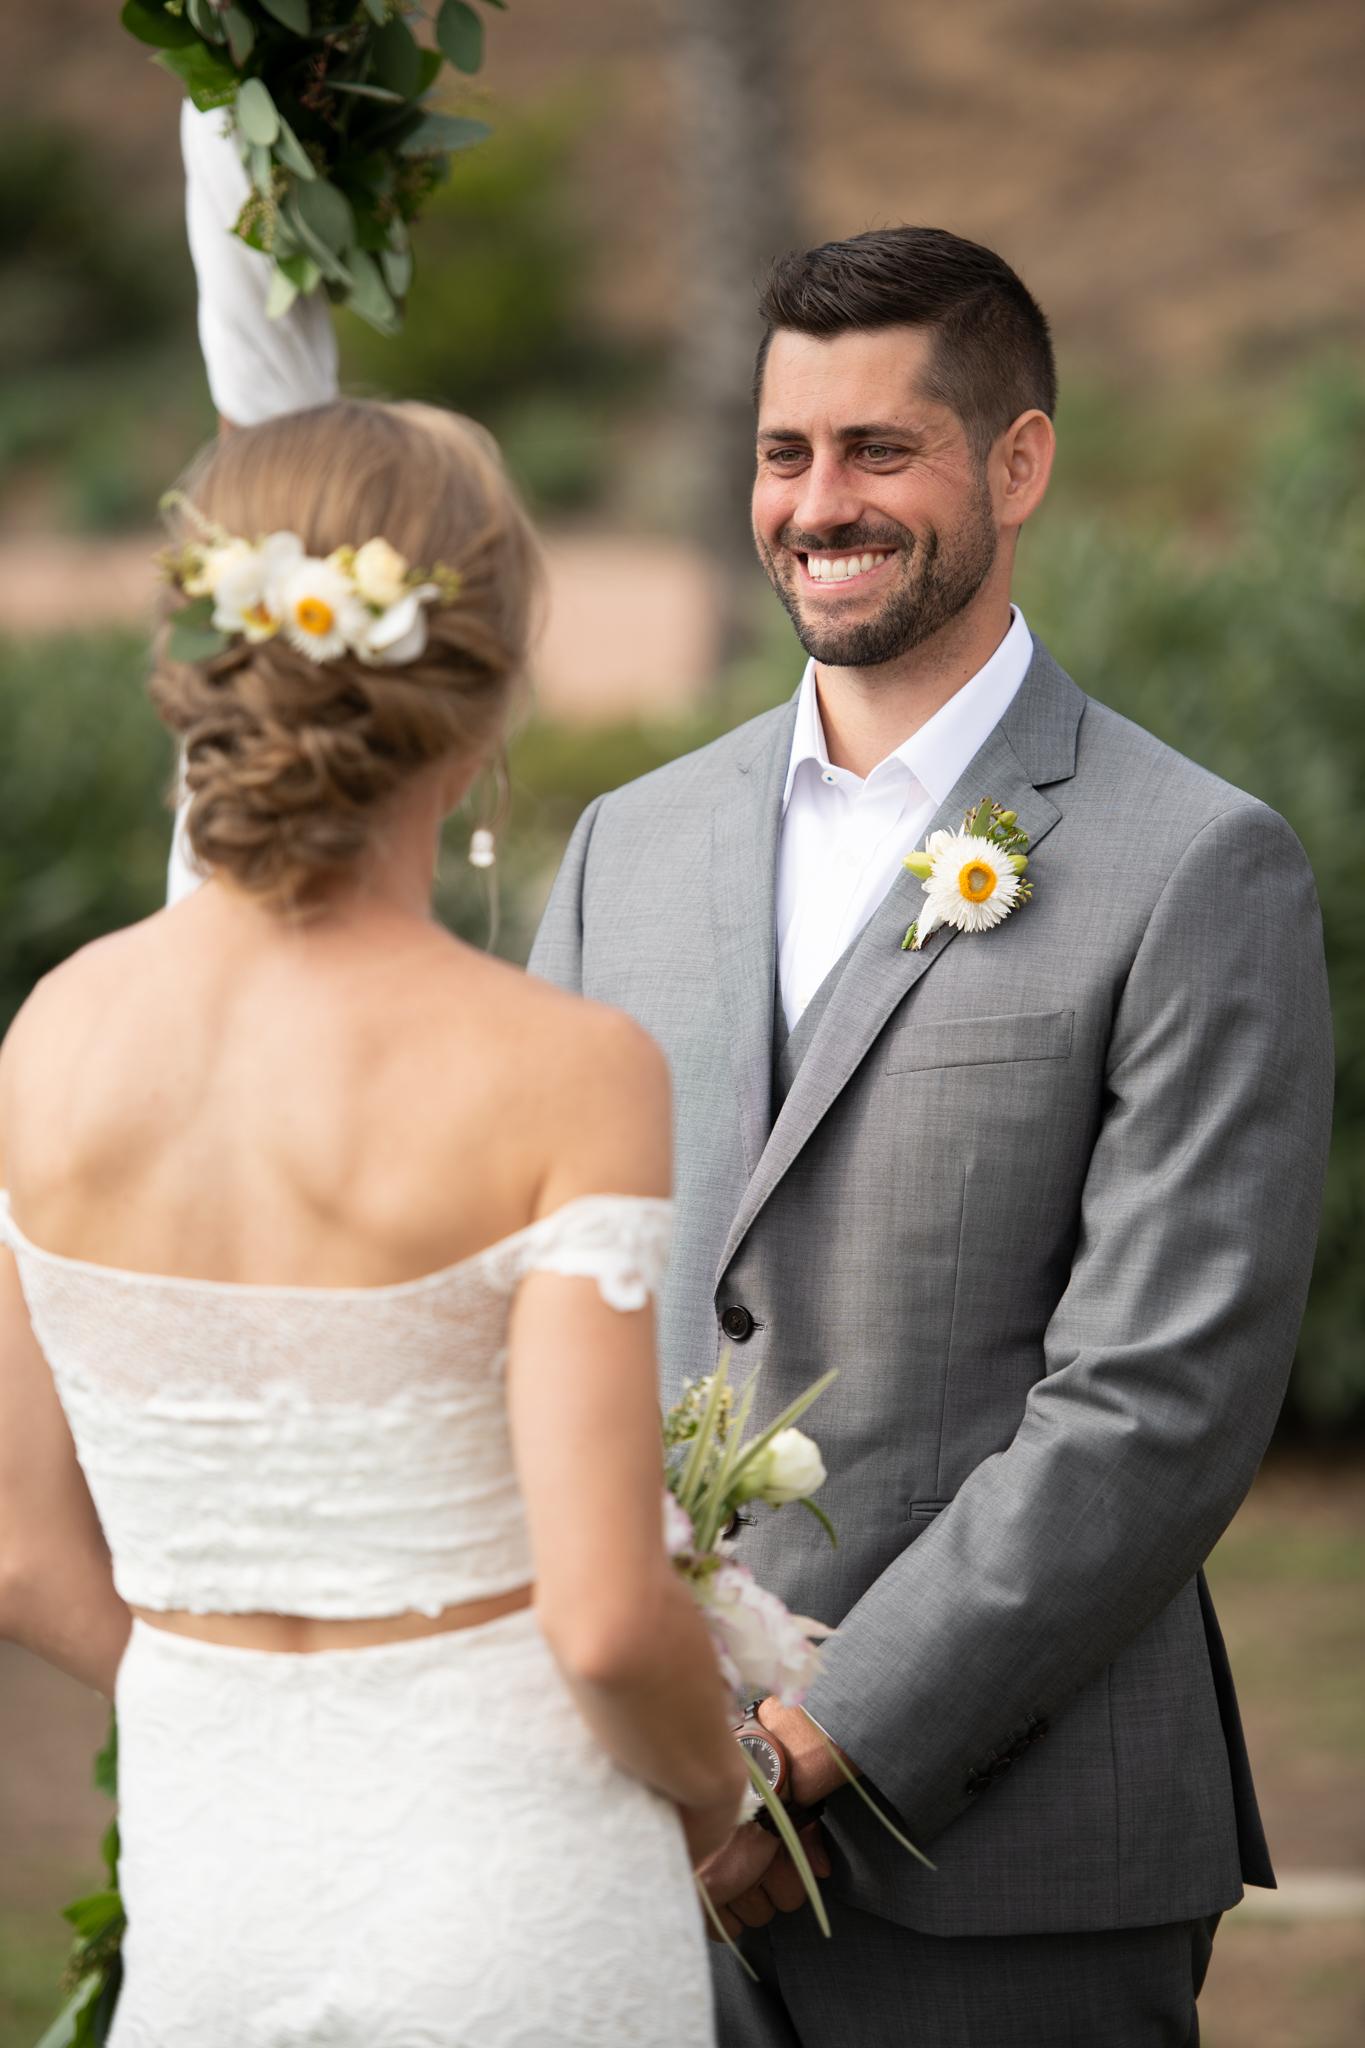 30_PRVW_Jenny_Ken_Wedding_Trevor_Hooper_Photo.jpg